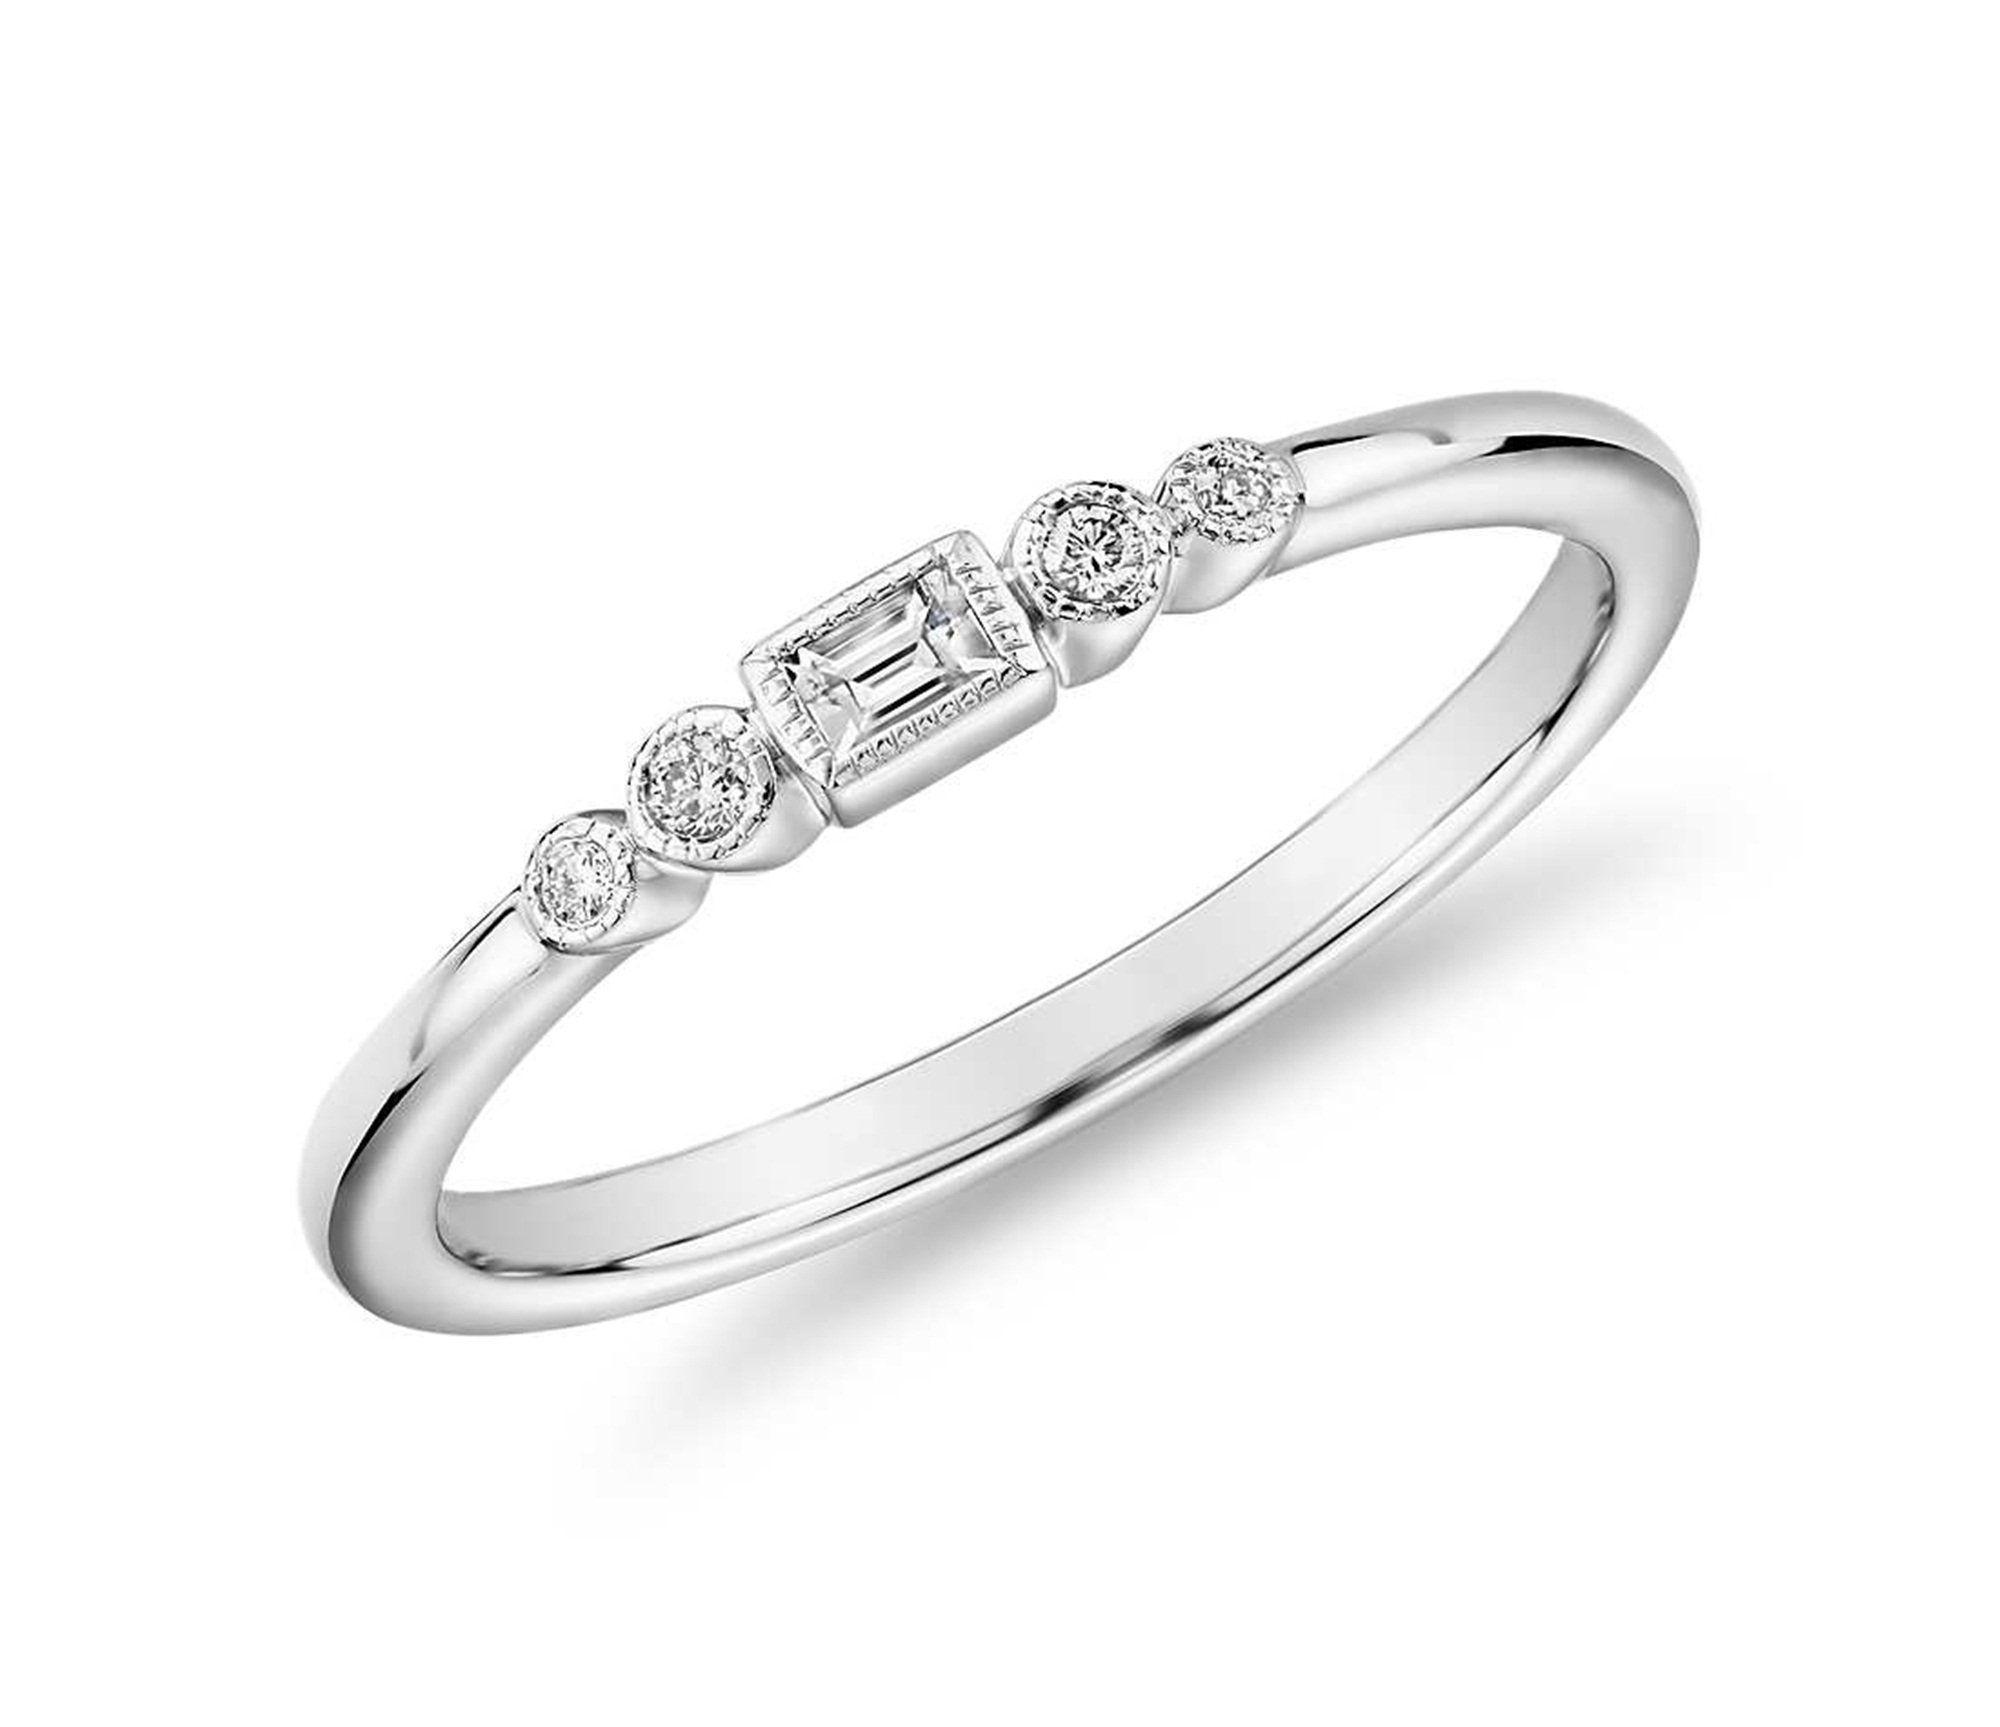 Designer Rings Stacking Ring Wedding Ring Stackable Rings Finger